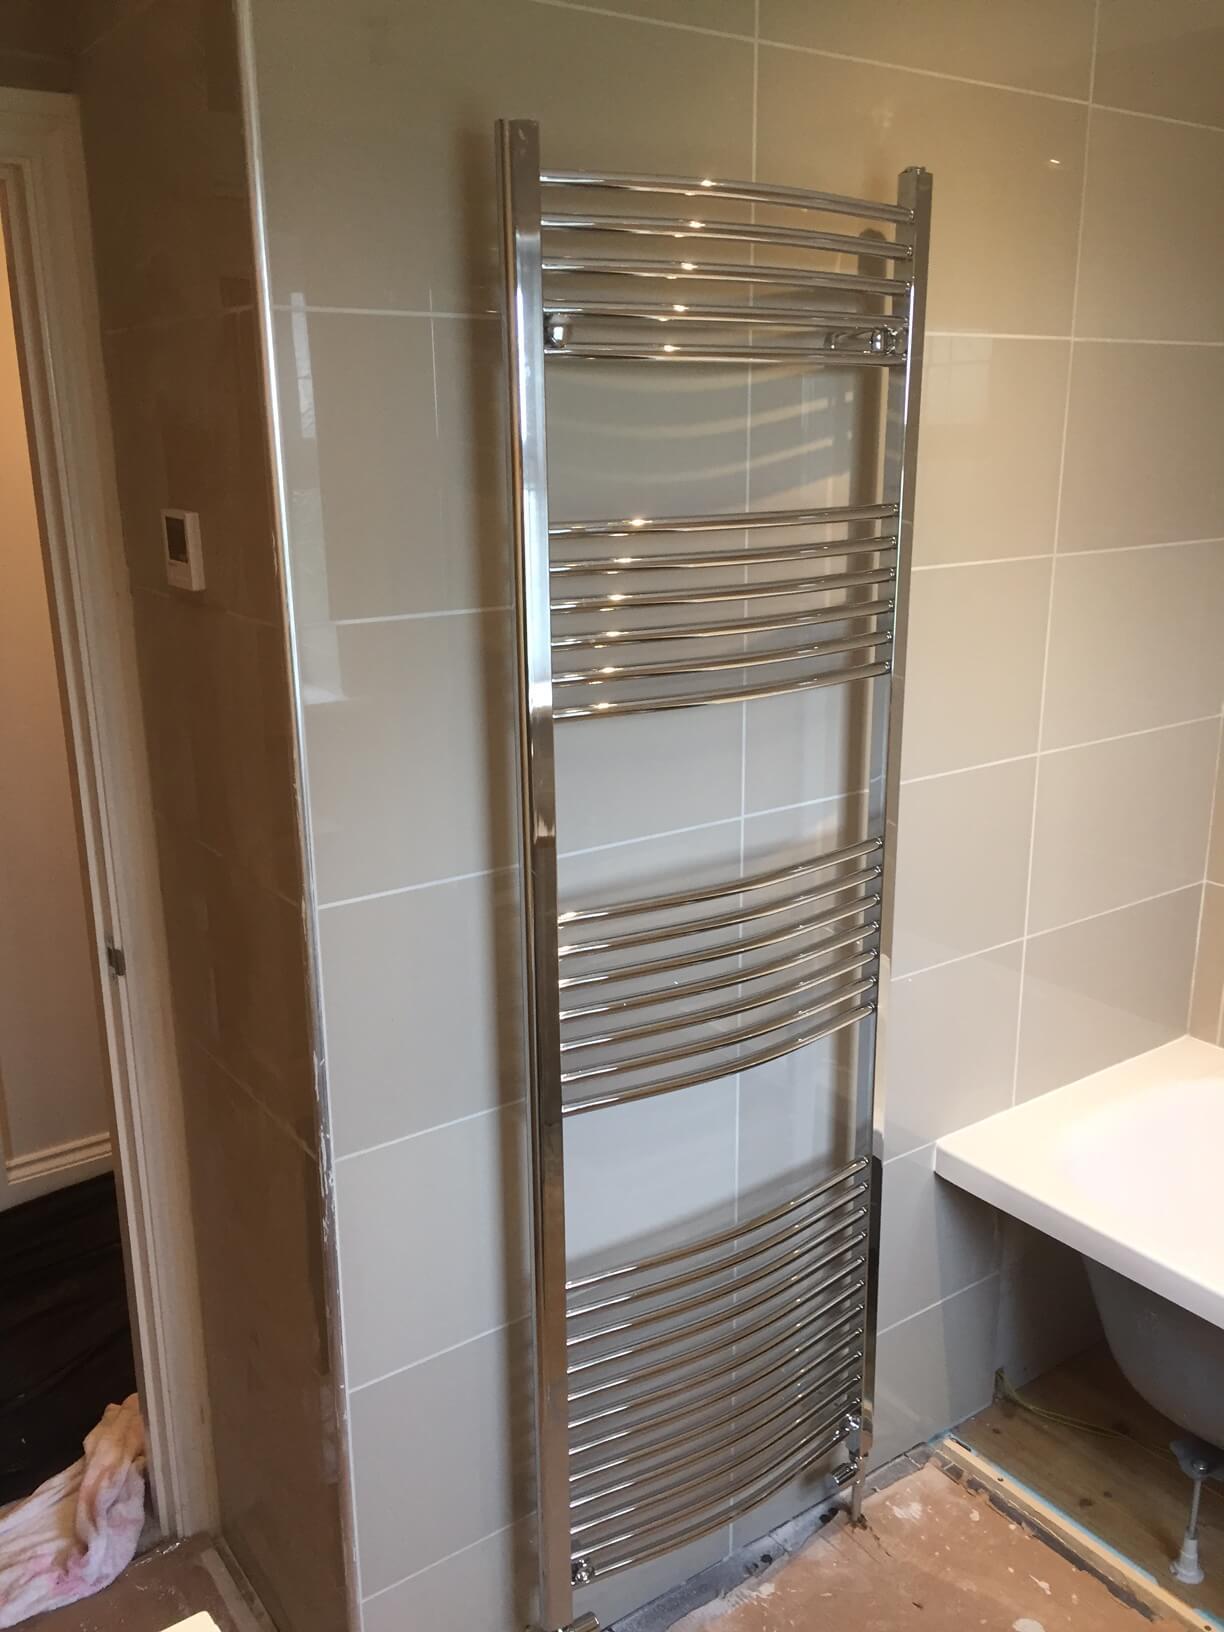 New tall radiator installed ready to go